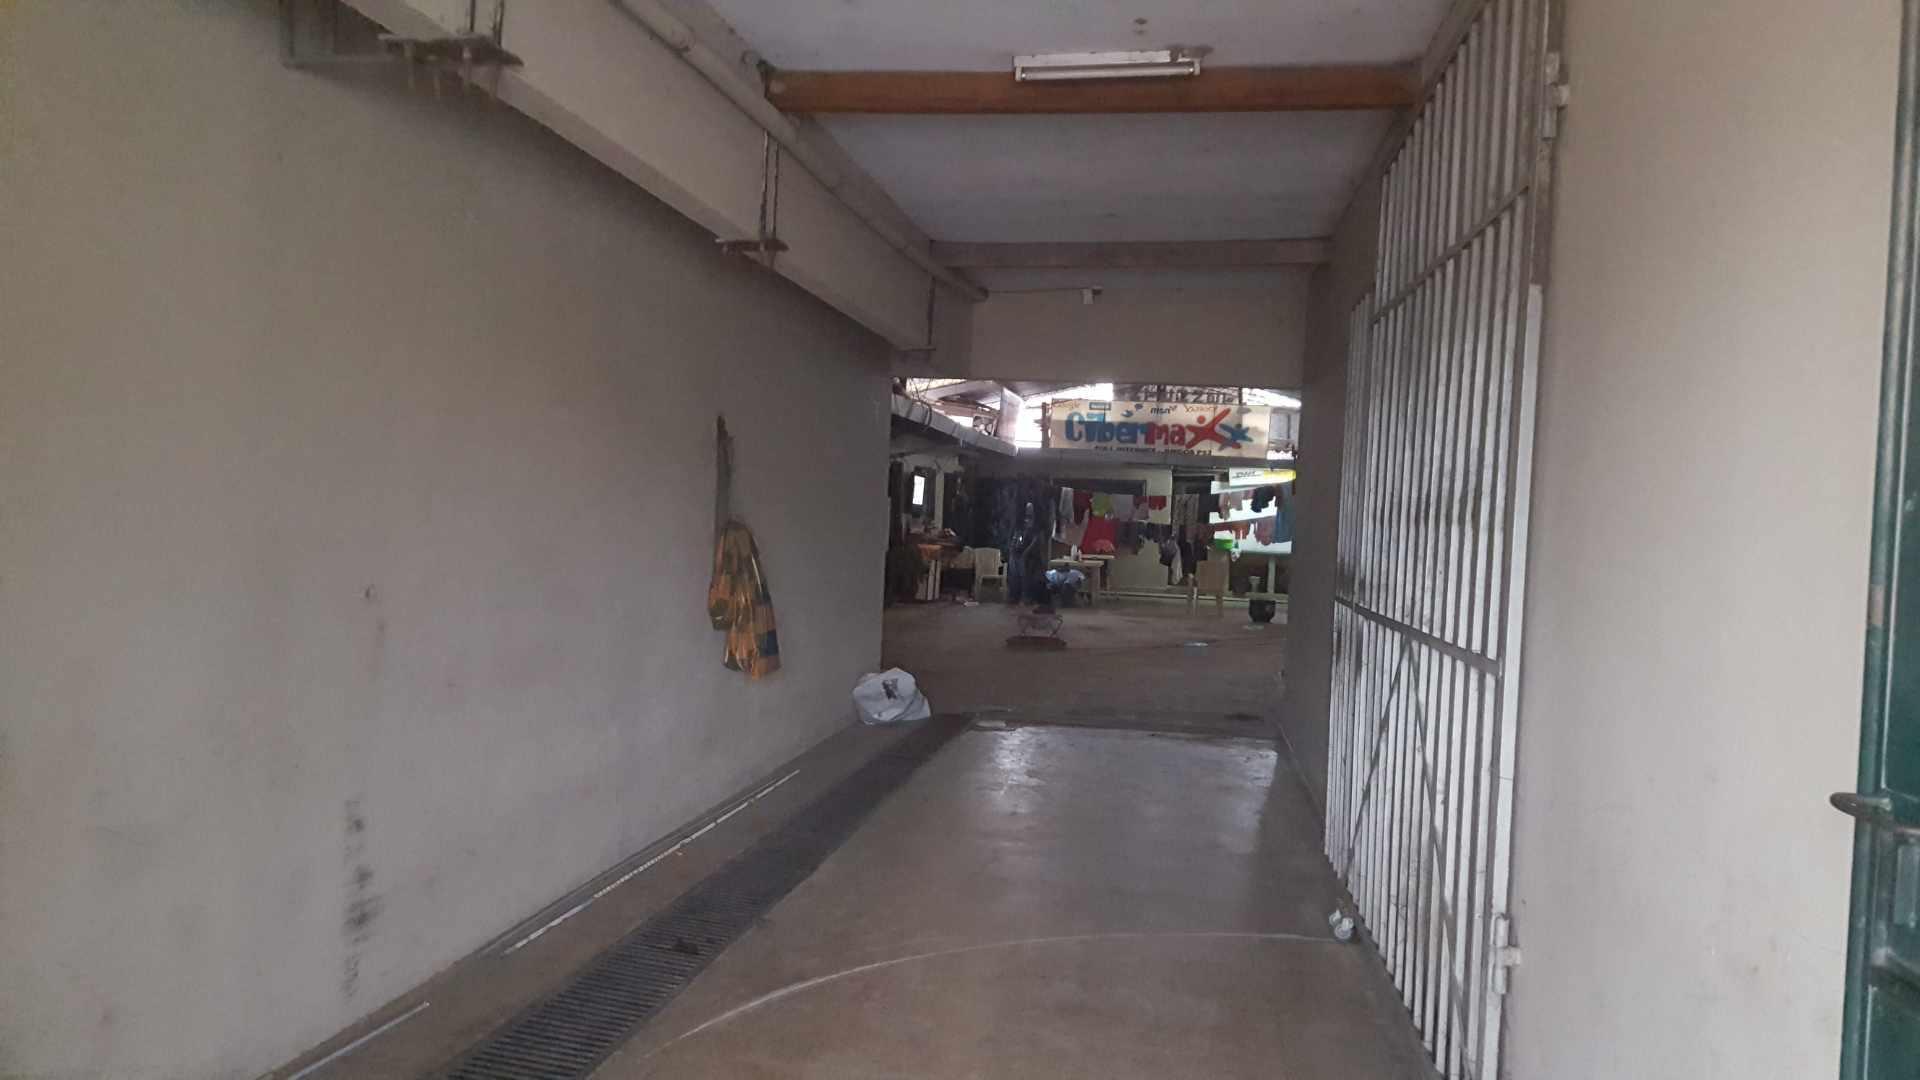 Local comercial en Venta Av. Rolando de Chazal a 10 mts del 4to anillo, amplia avenida pavimentada entre Brasil y Virgen de Cotoca Foto 4